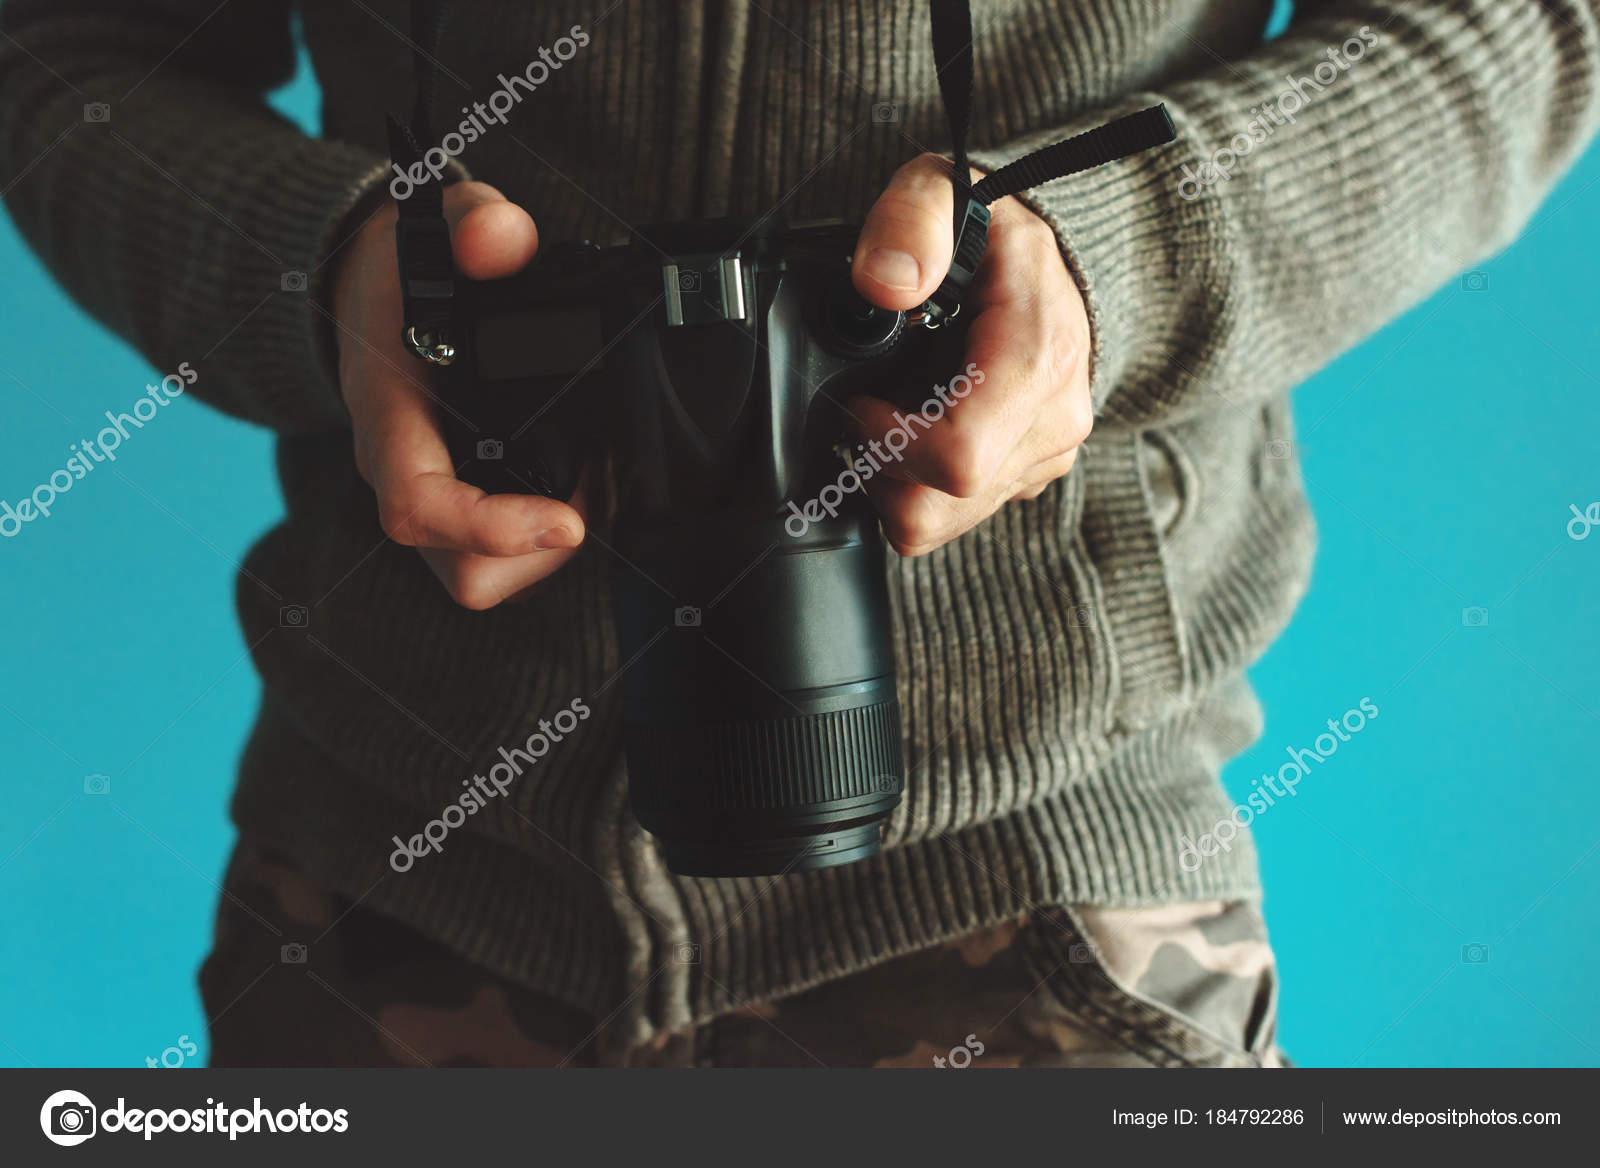 Fotógrafo con completo marco sensor Dslr cámara — Foto de stock ...